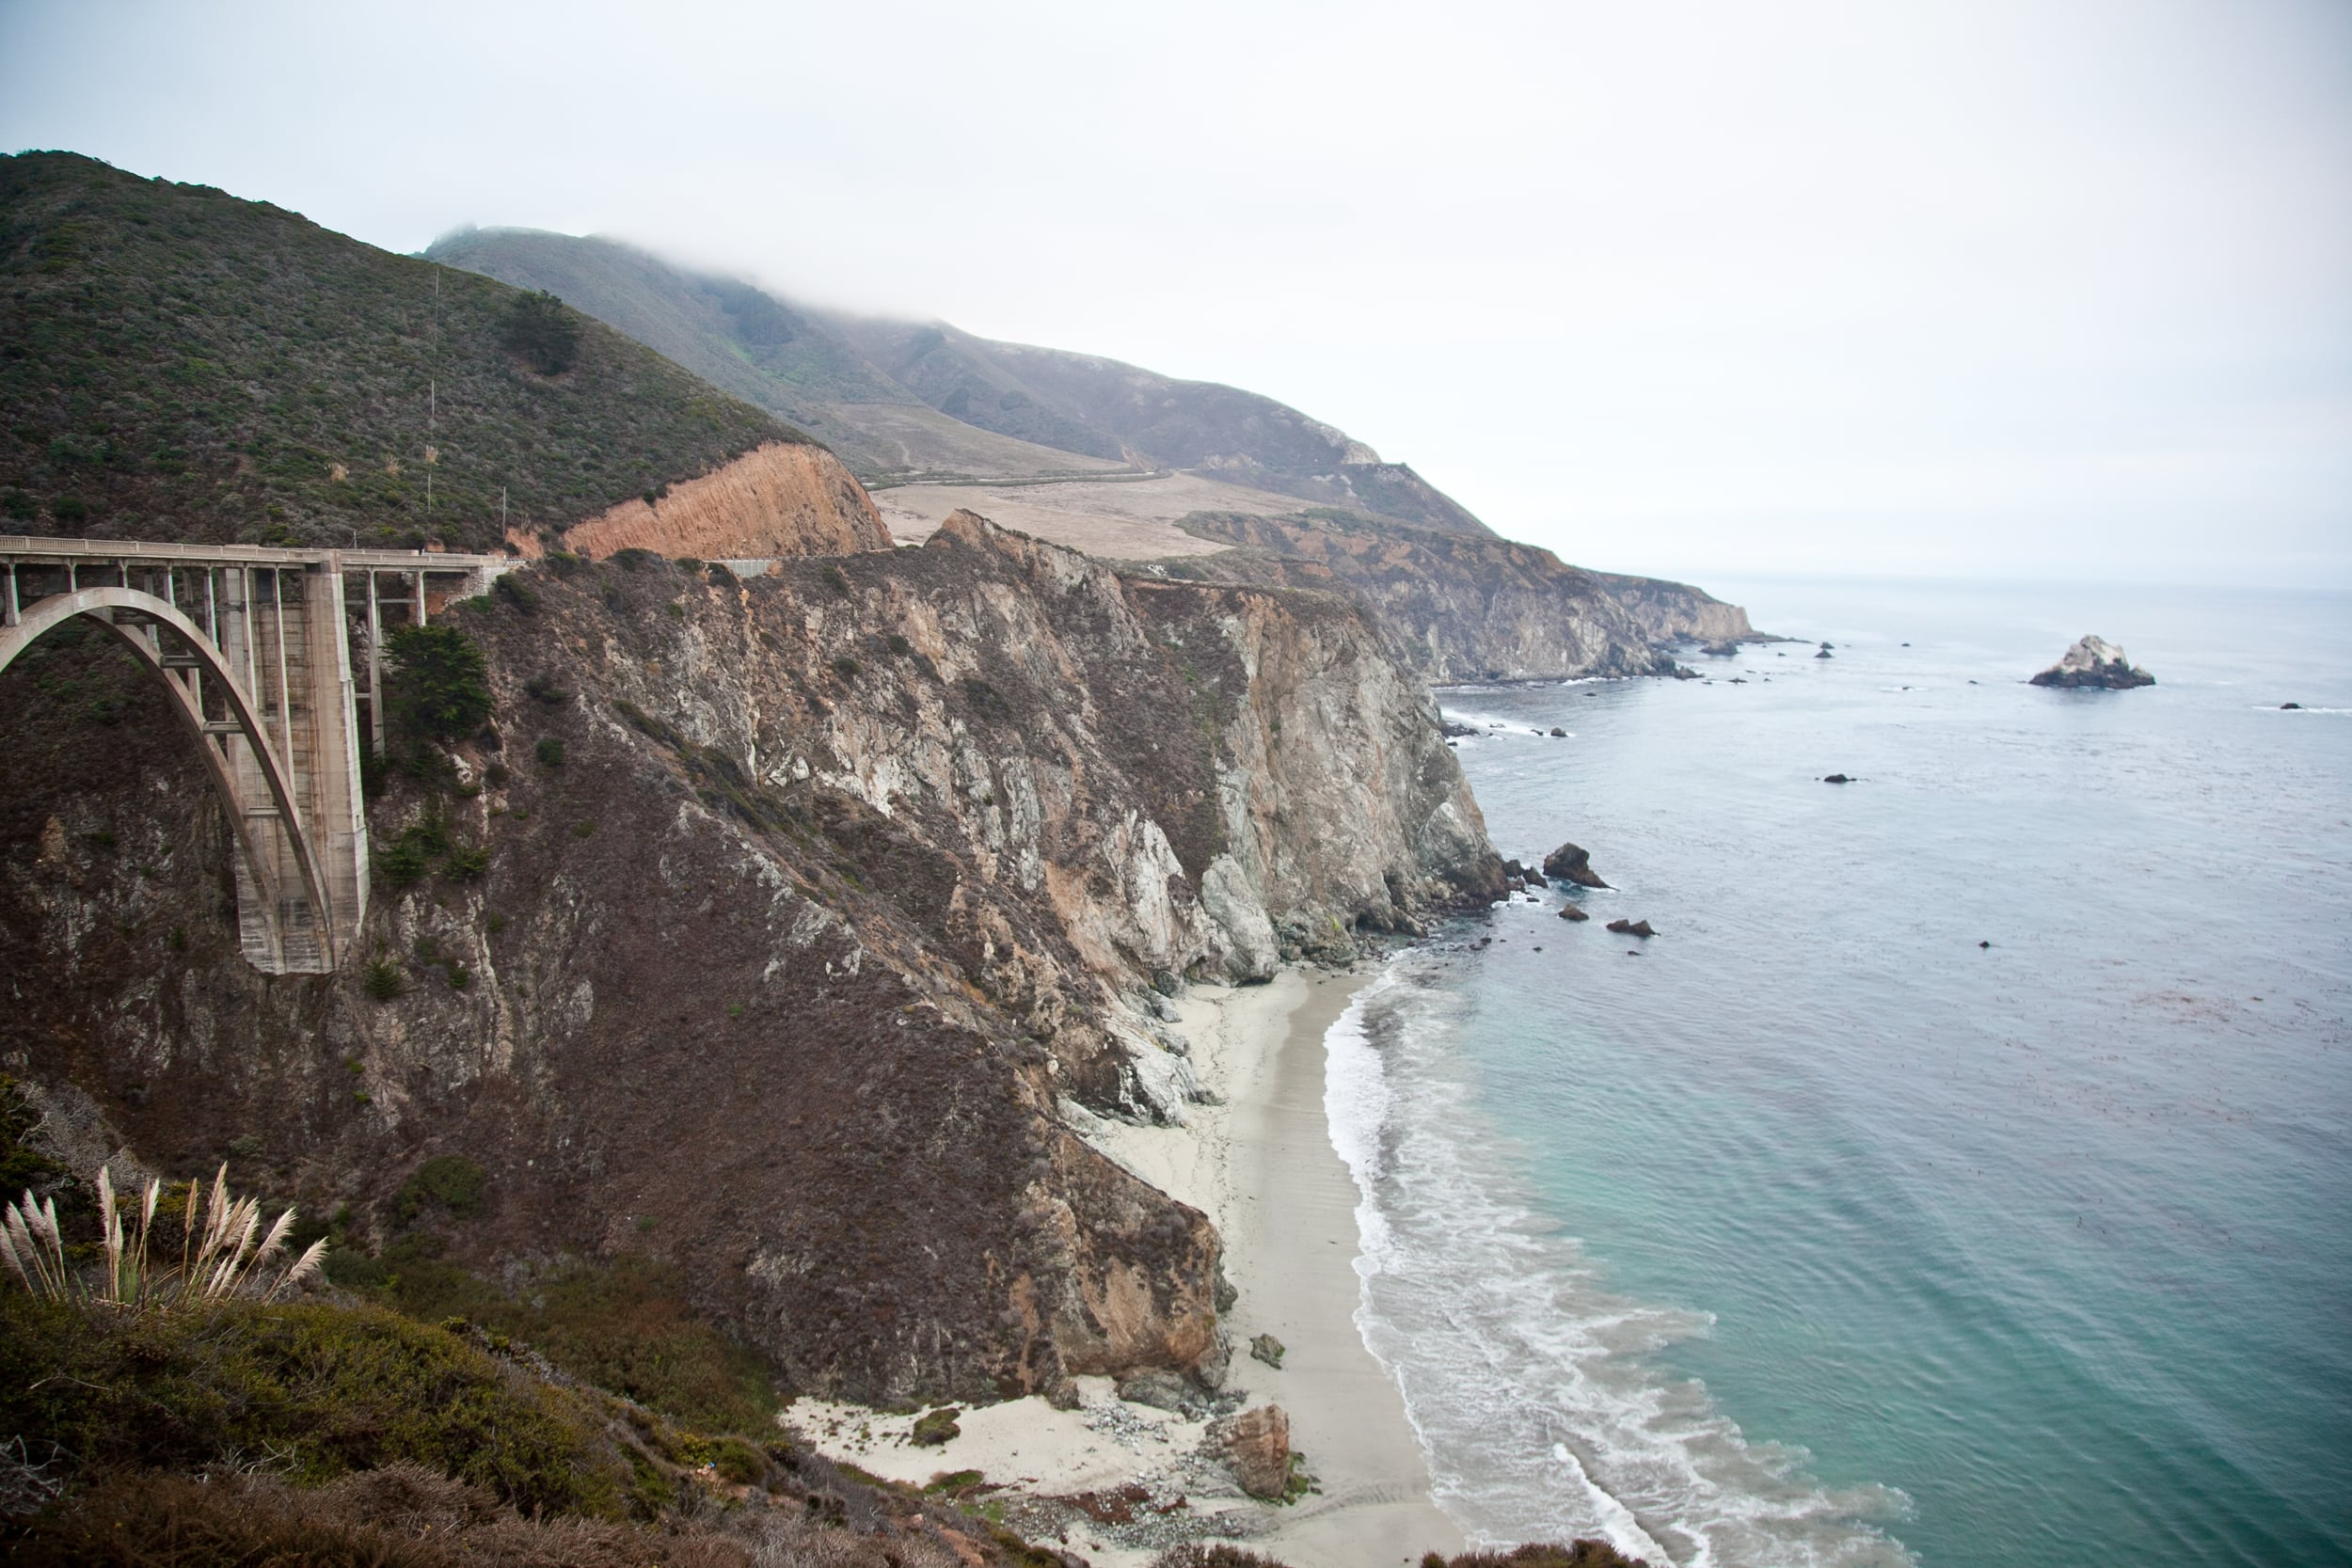 IMG_6196-big-sur-california-coast-trisa-taro.jpg